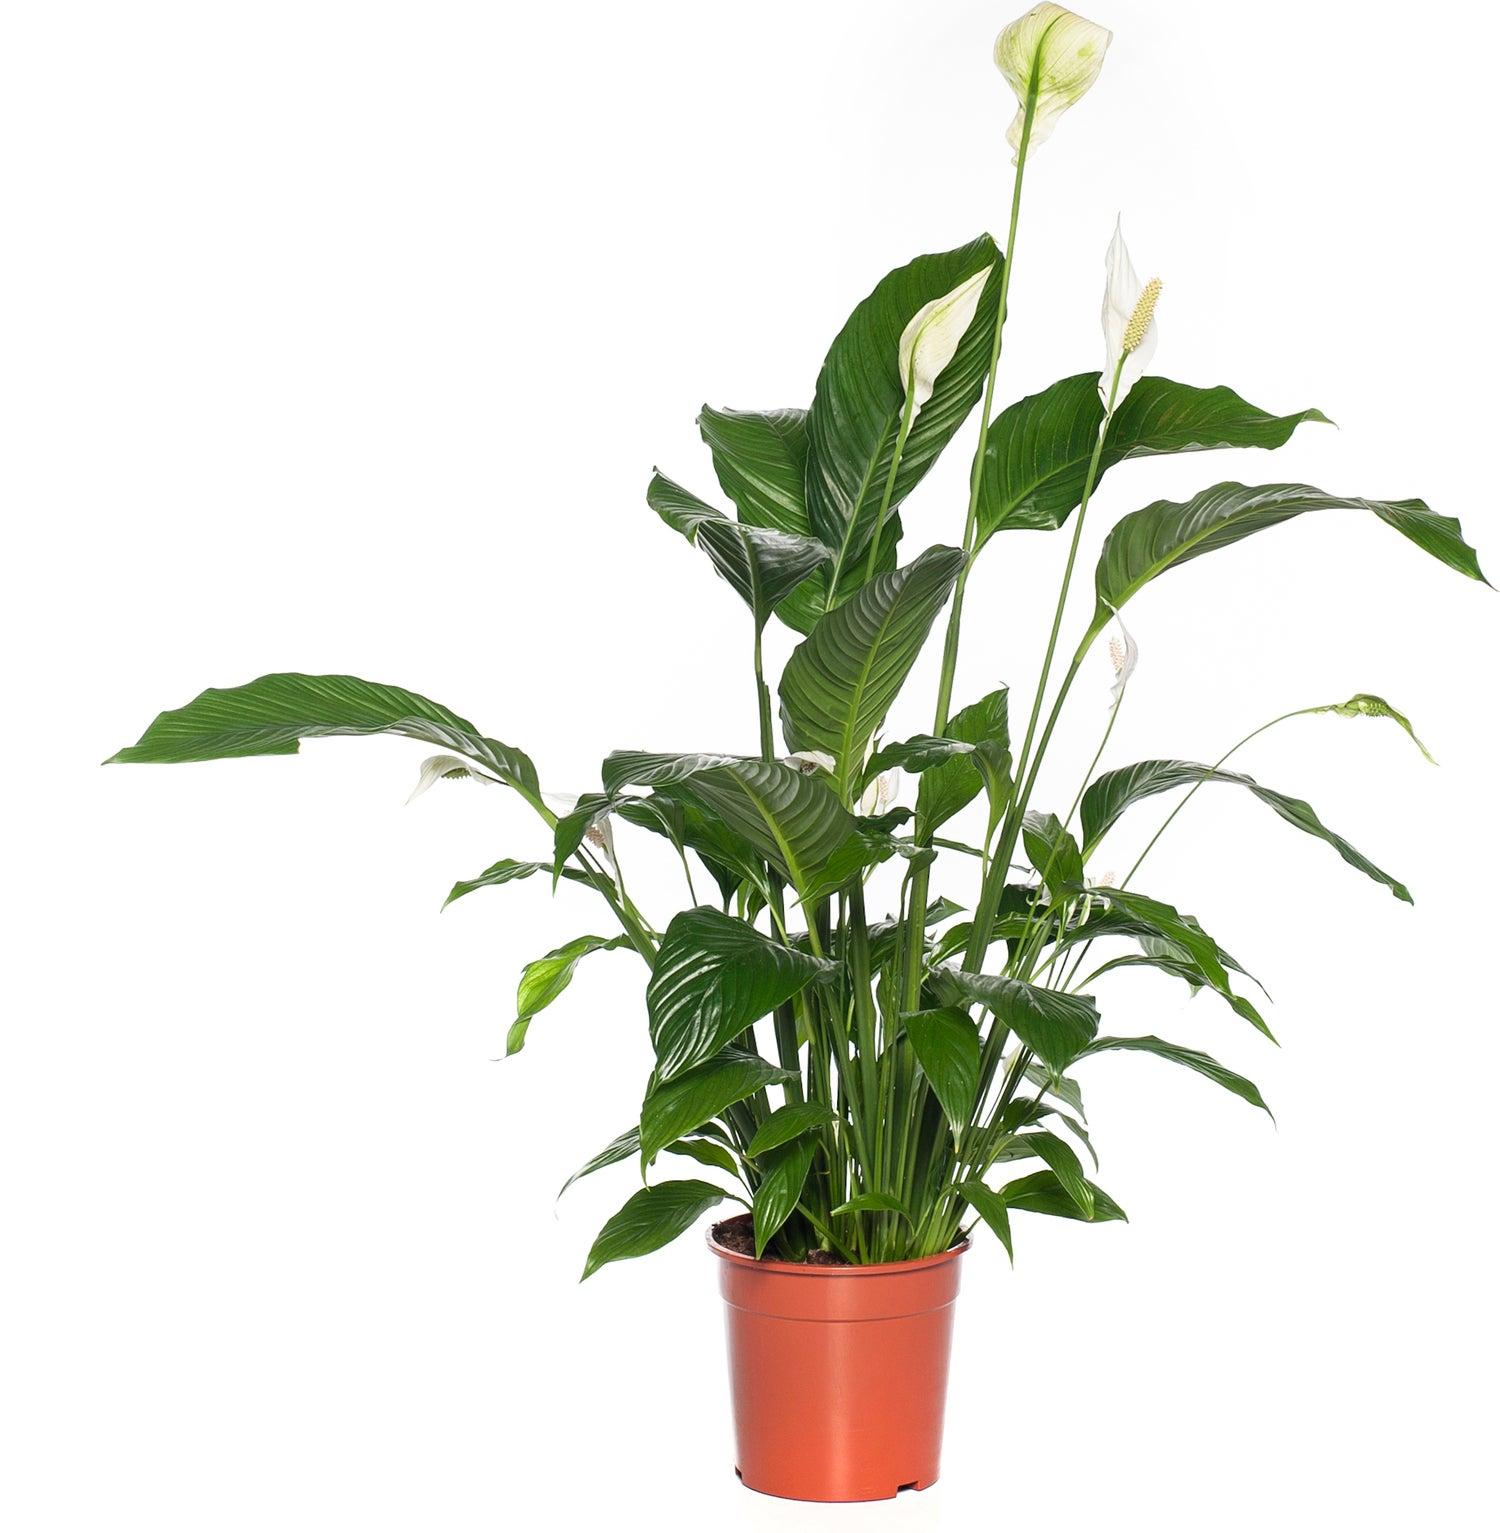 Lepelplant (Spathiphyllum 'Sweet Sebastiano') D 24 H 130 cm